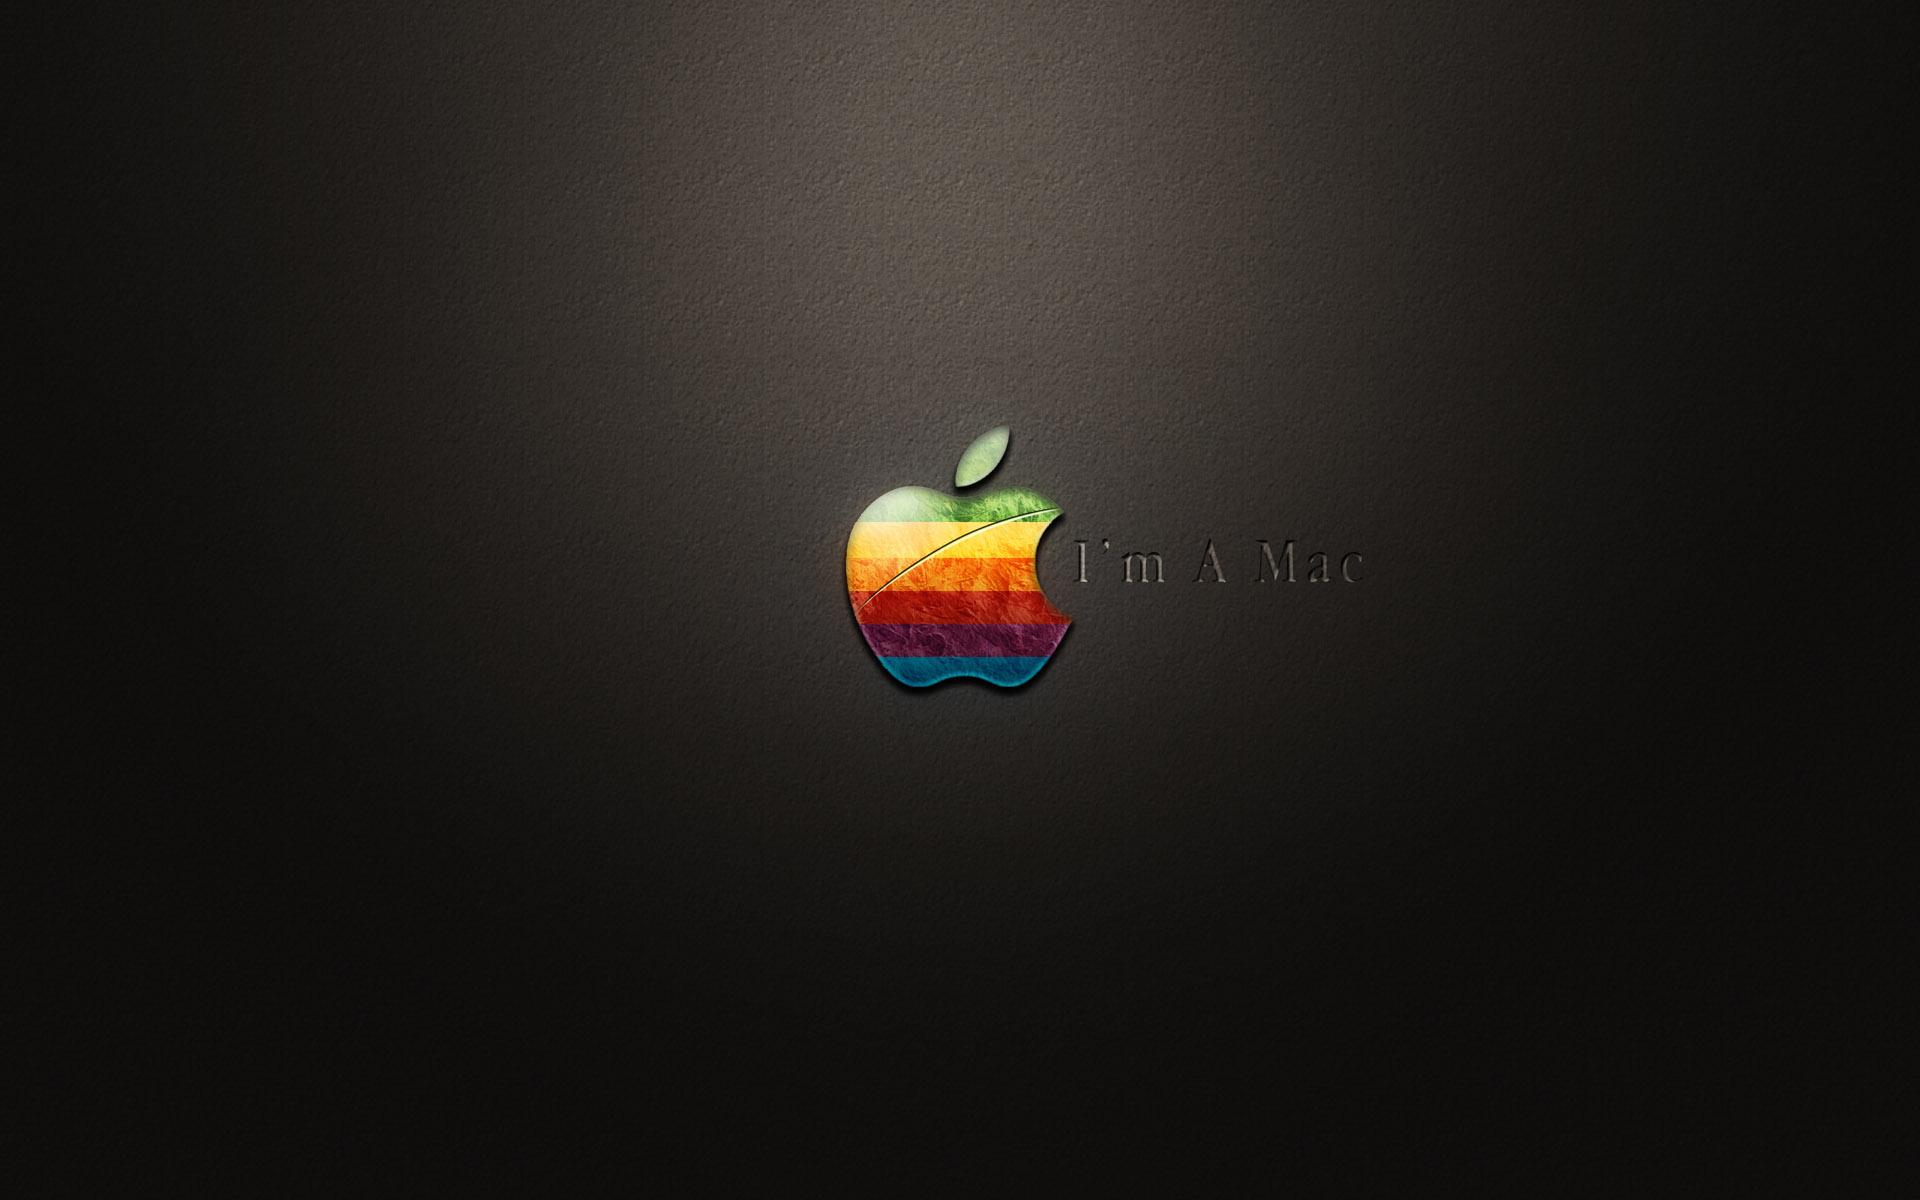 mac hd wallpaper 575483